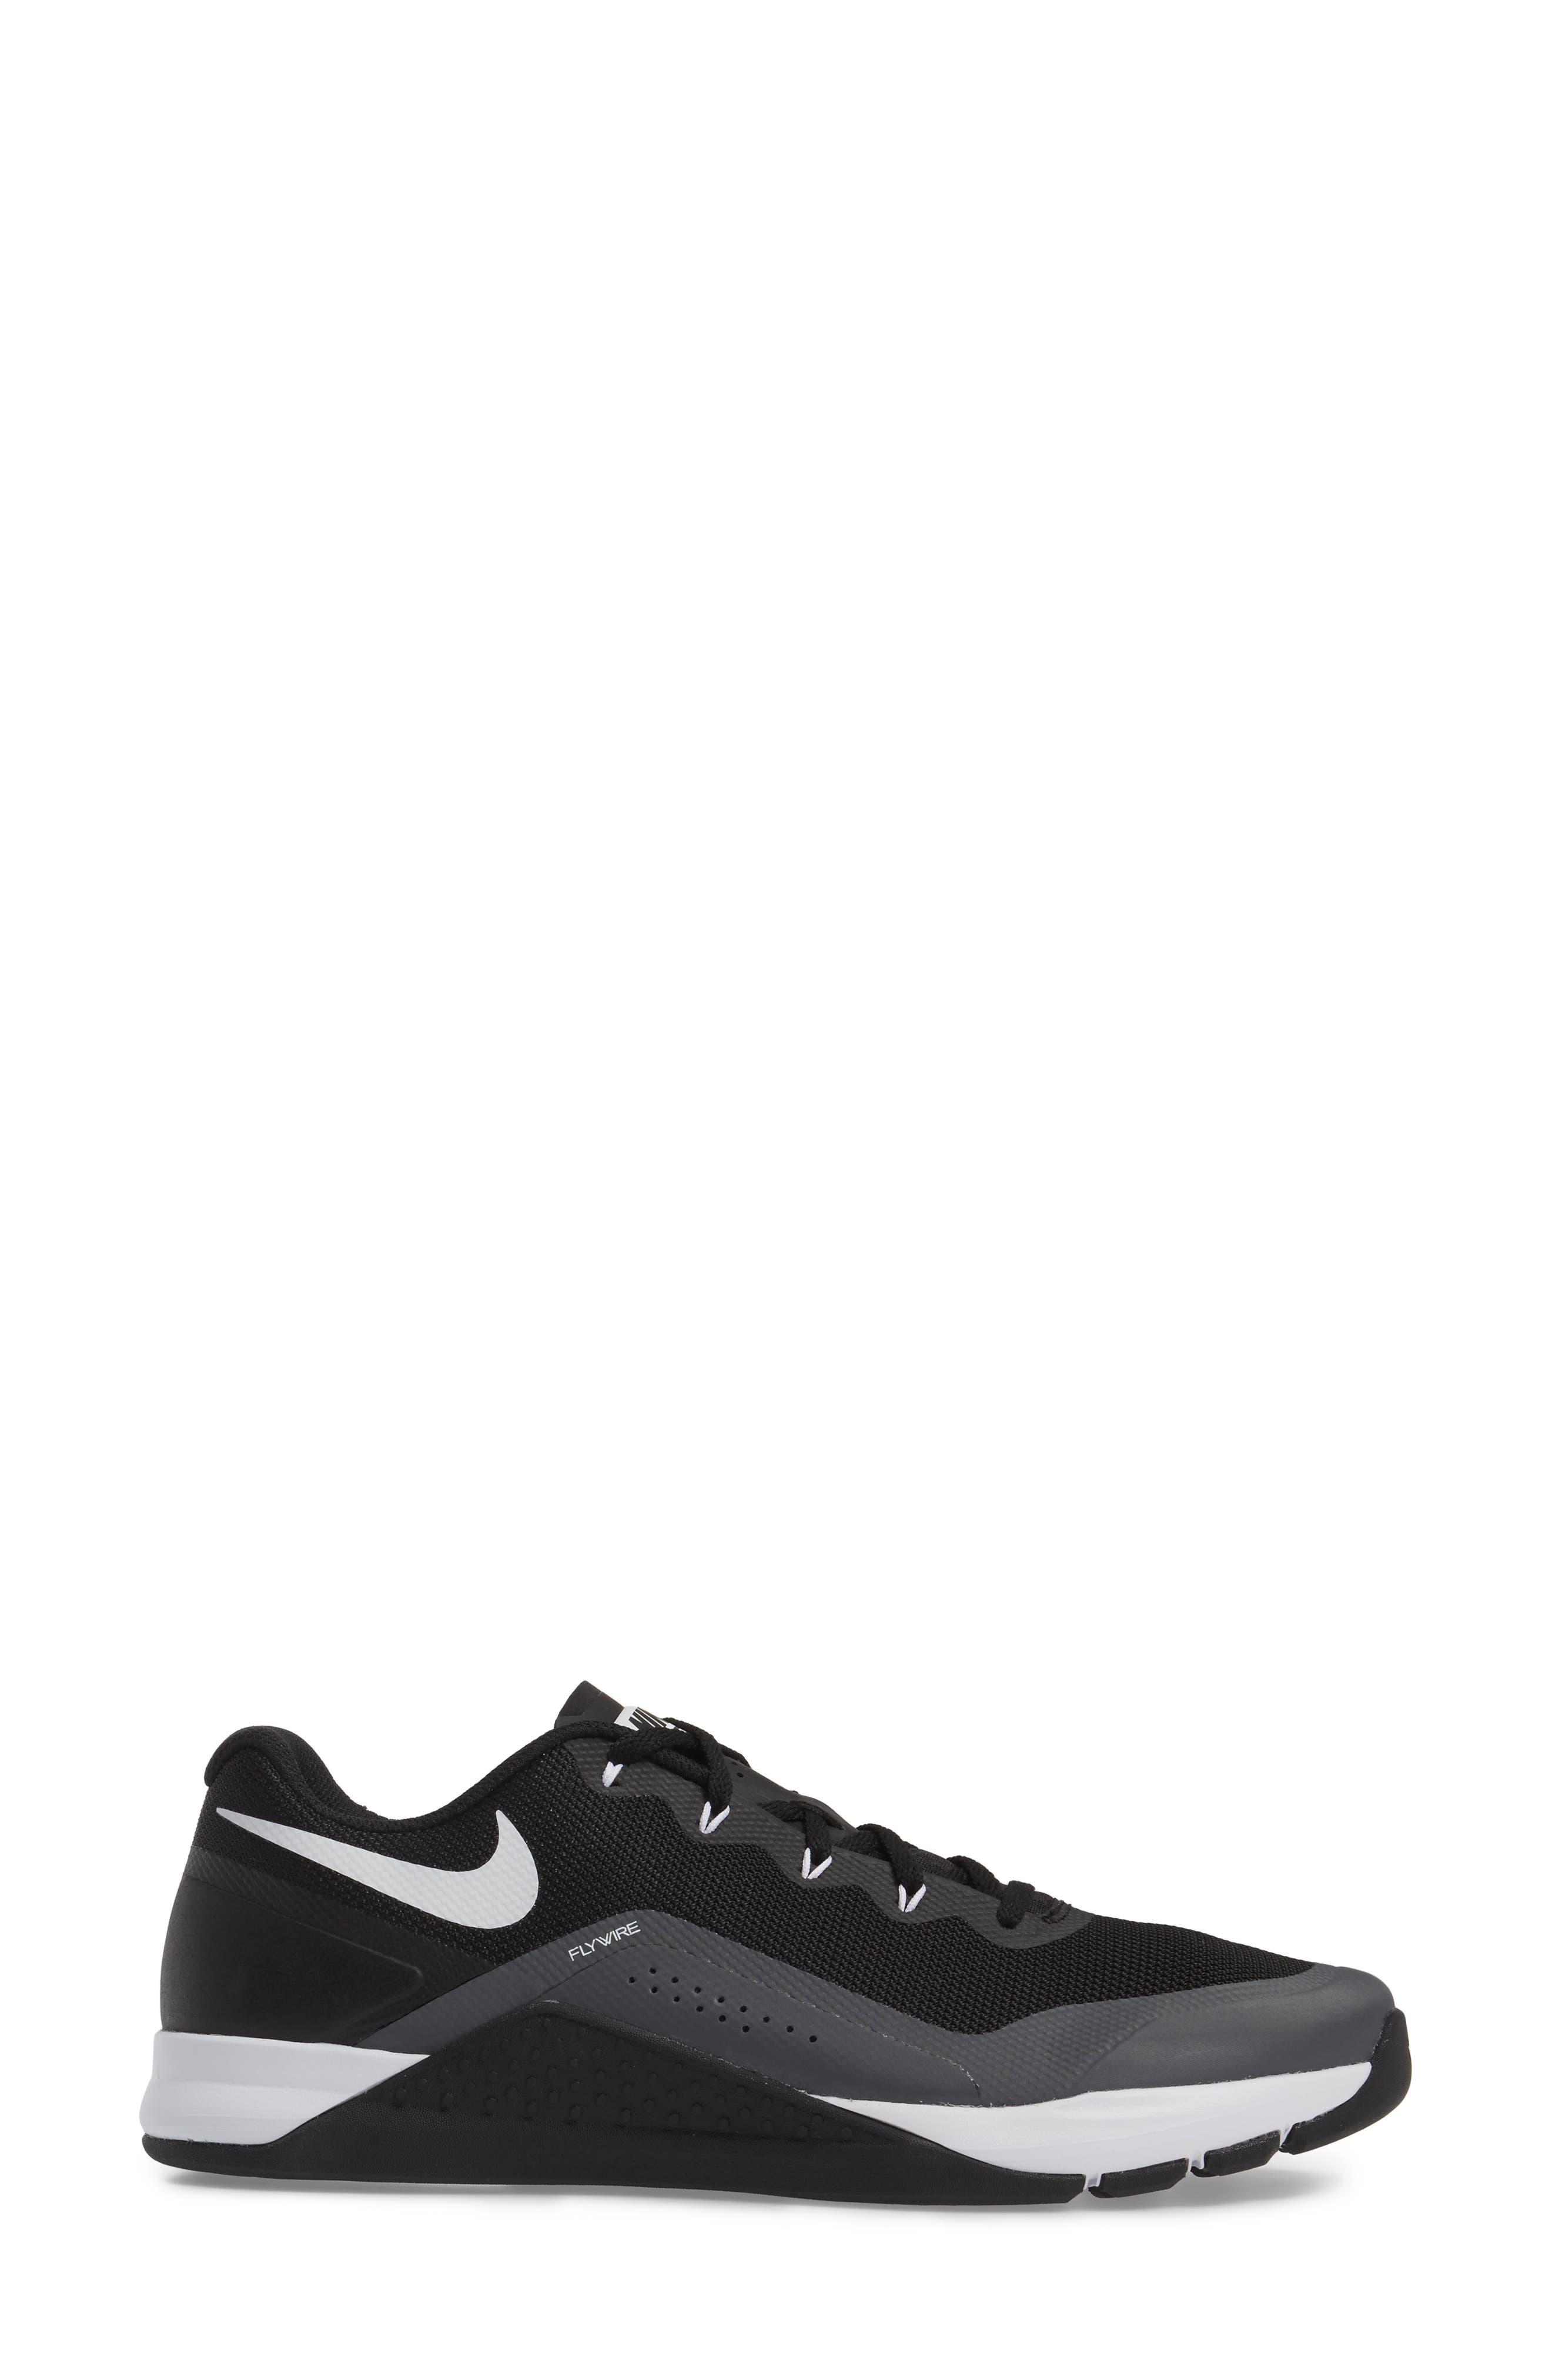 Alternate Image 3  - Nike Metcon Repper DSX Training Shoe (Women)